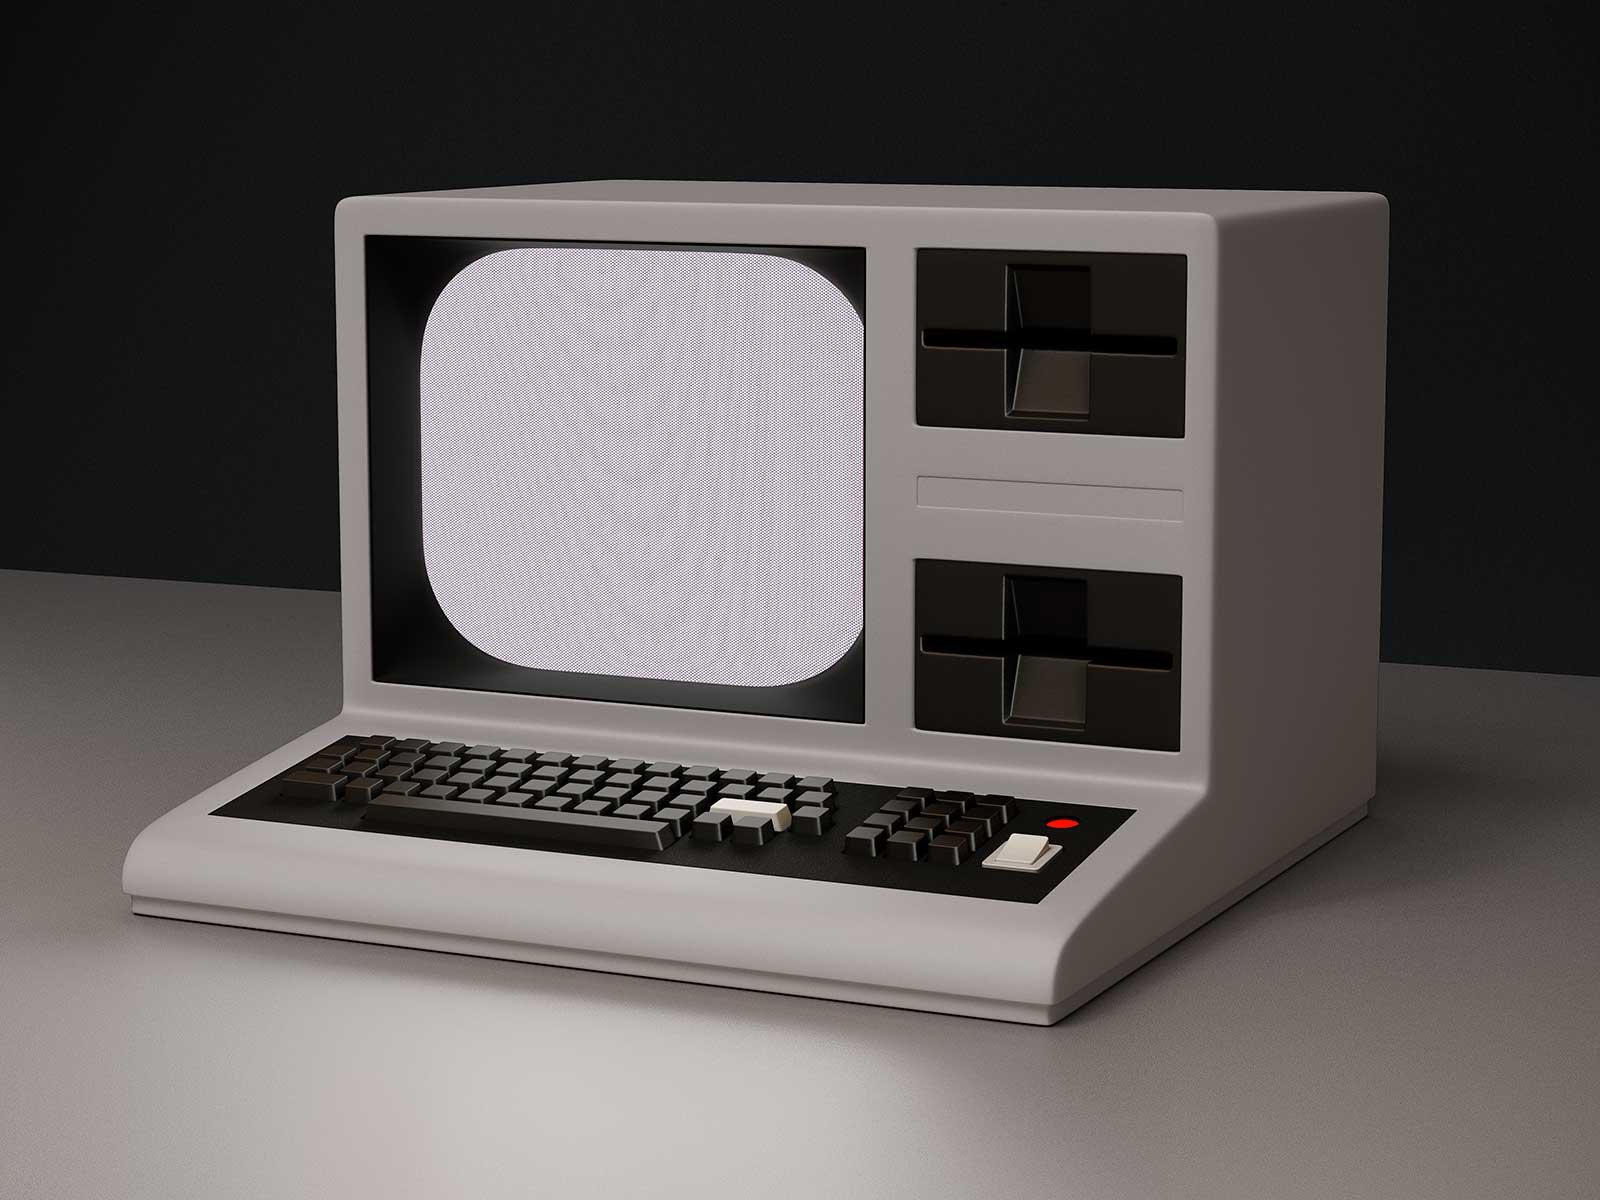 Monitor I 06, CGI Fine Art Print, 39 x 52 cm, 2013